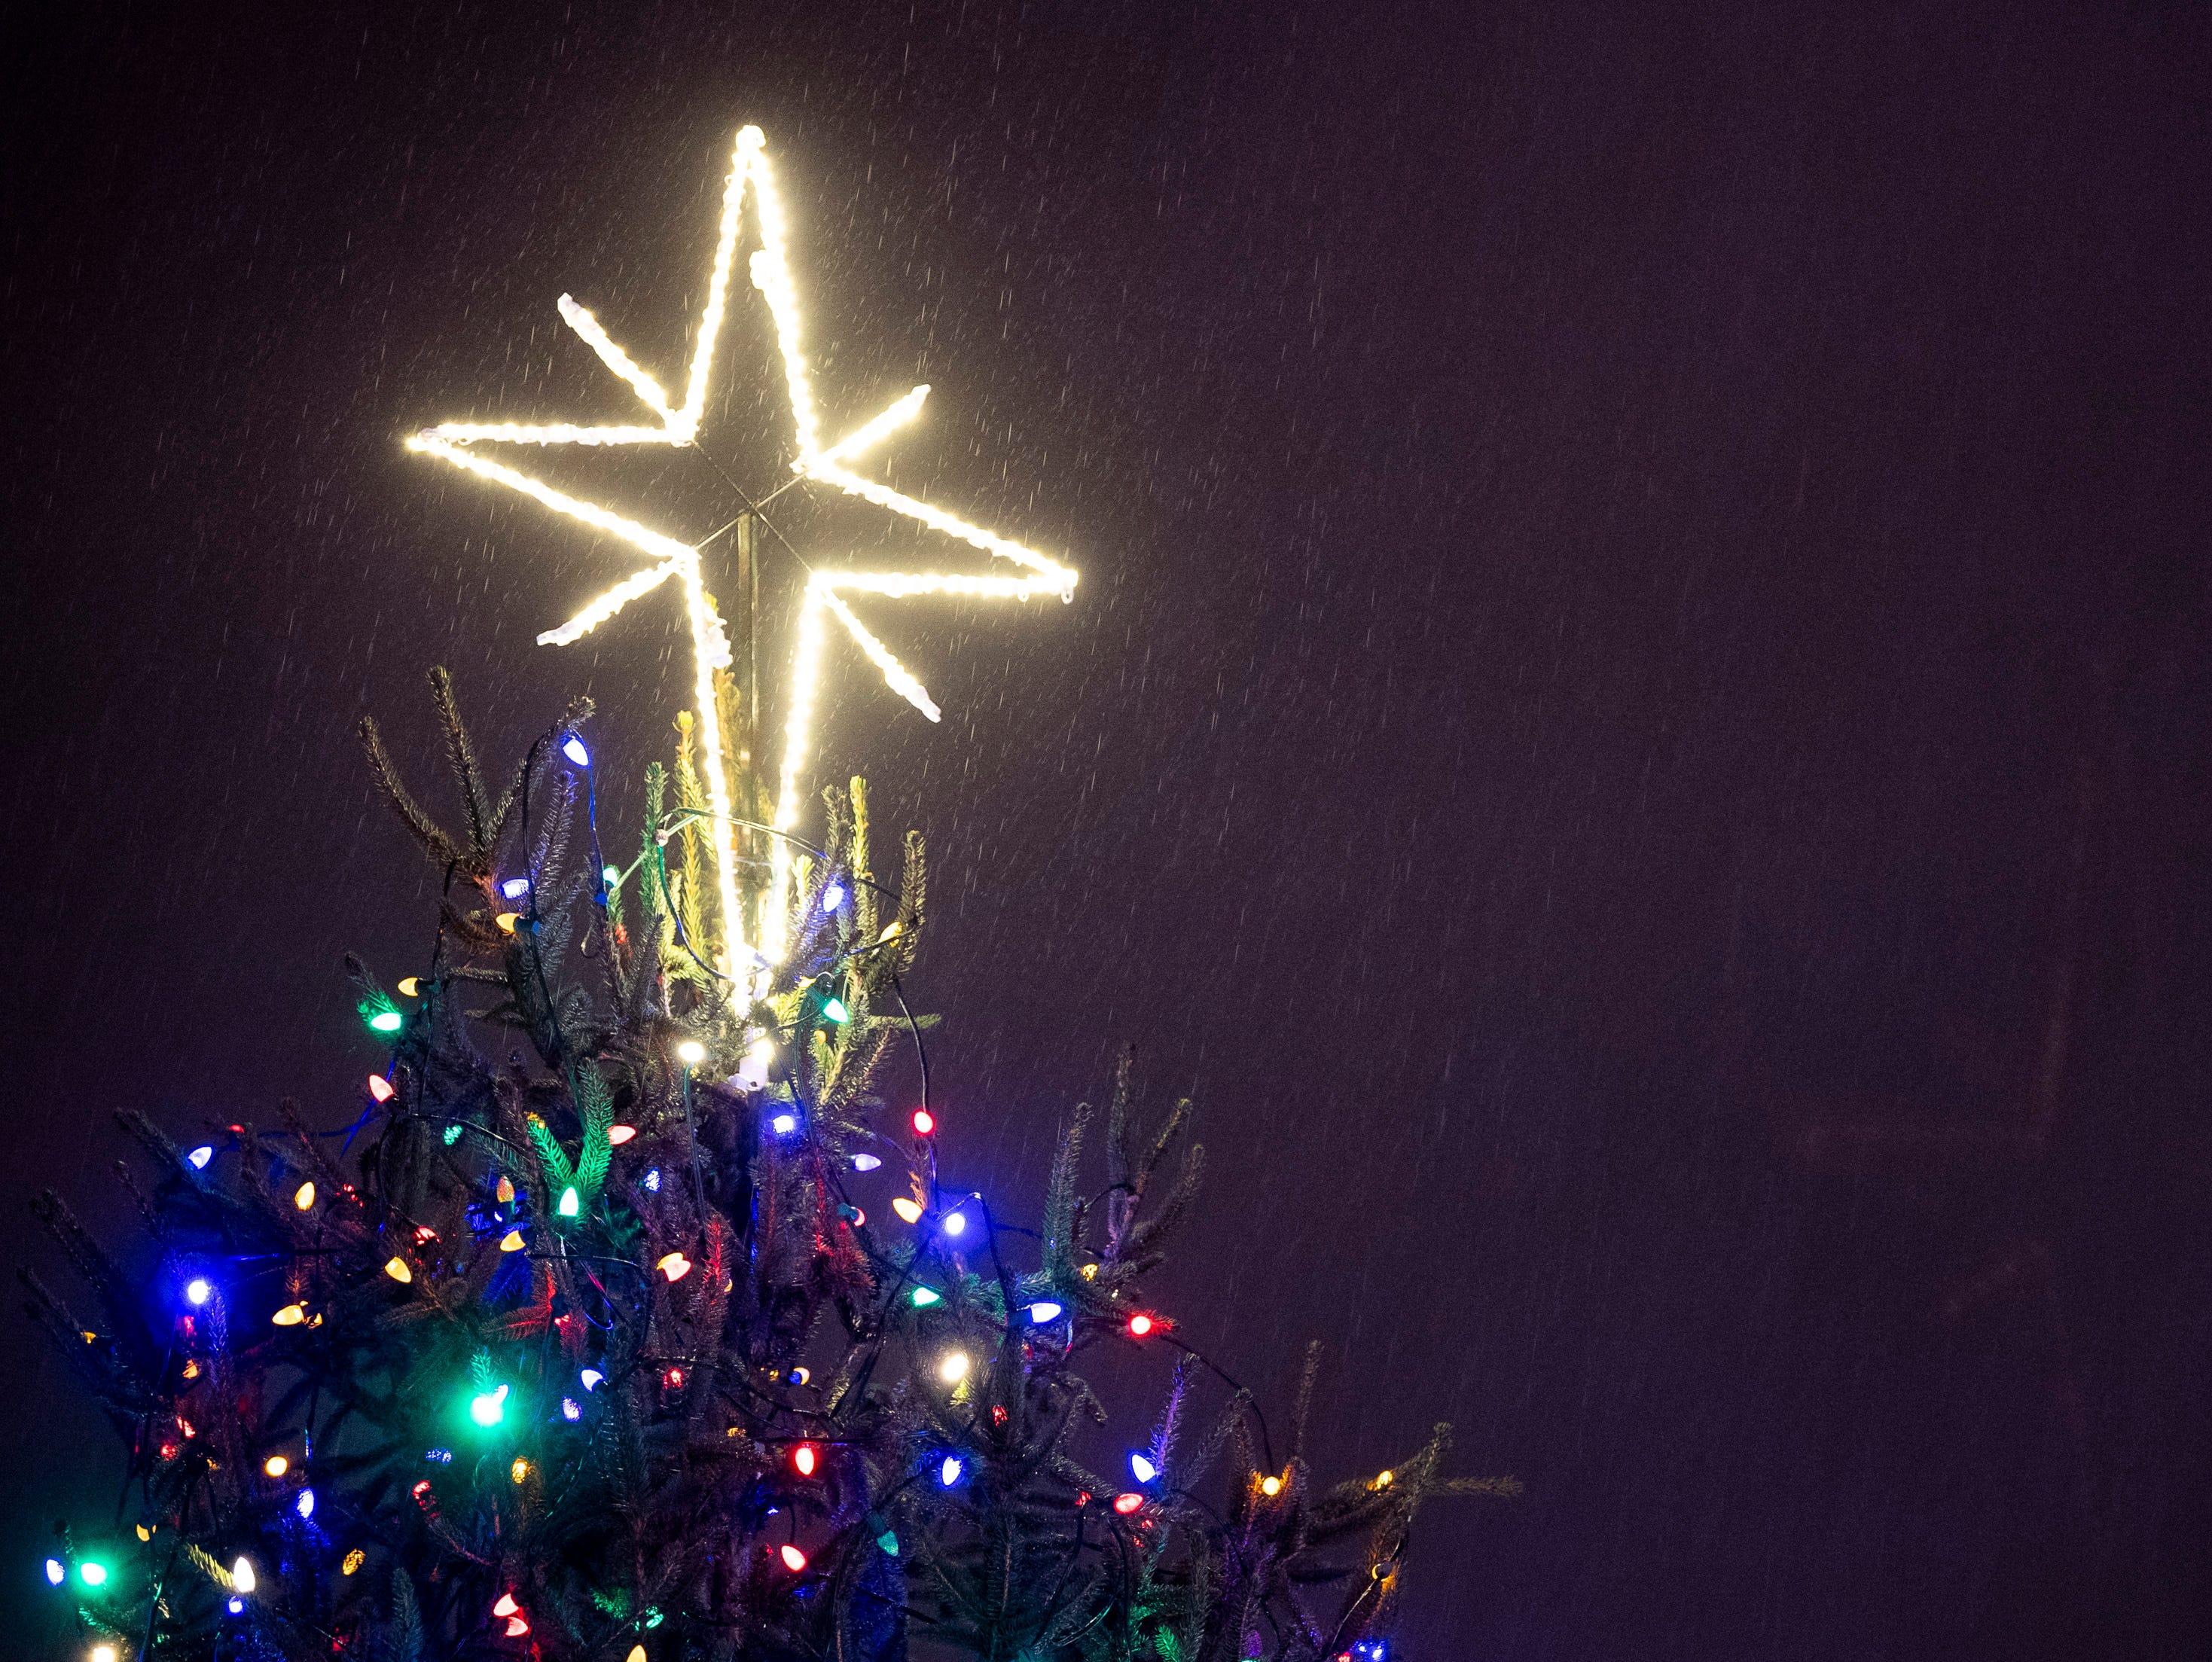 Rain falls as the tree is lit during the Metro Nashville Christmas Tree Lighting event at Public Square Park in Nashville, Tenn., Friday, Nov. 30, 2018.